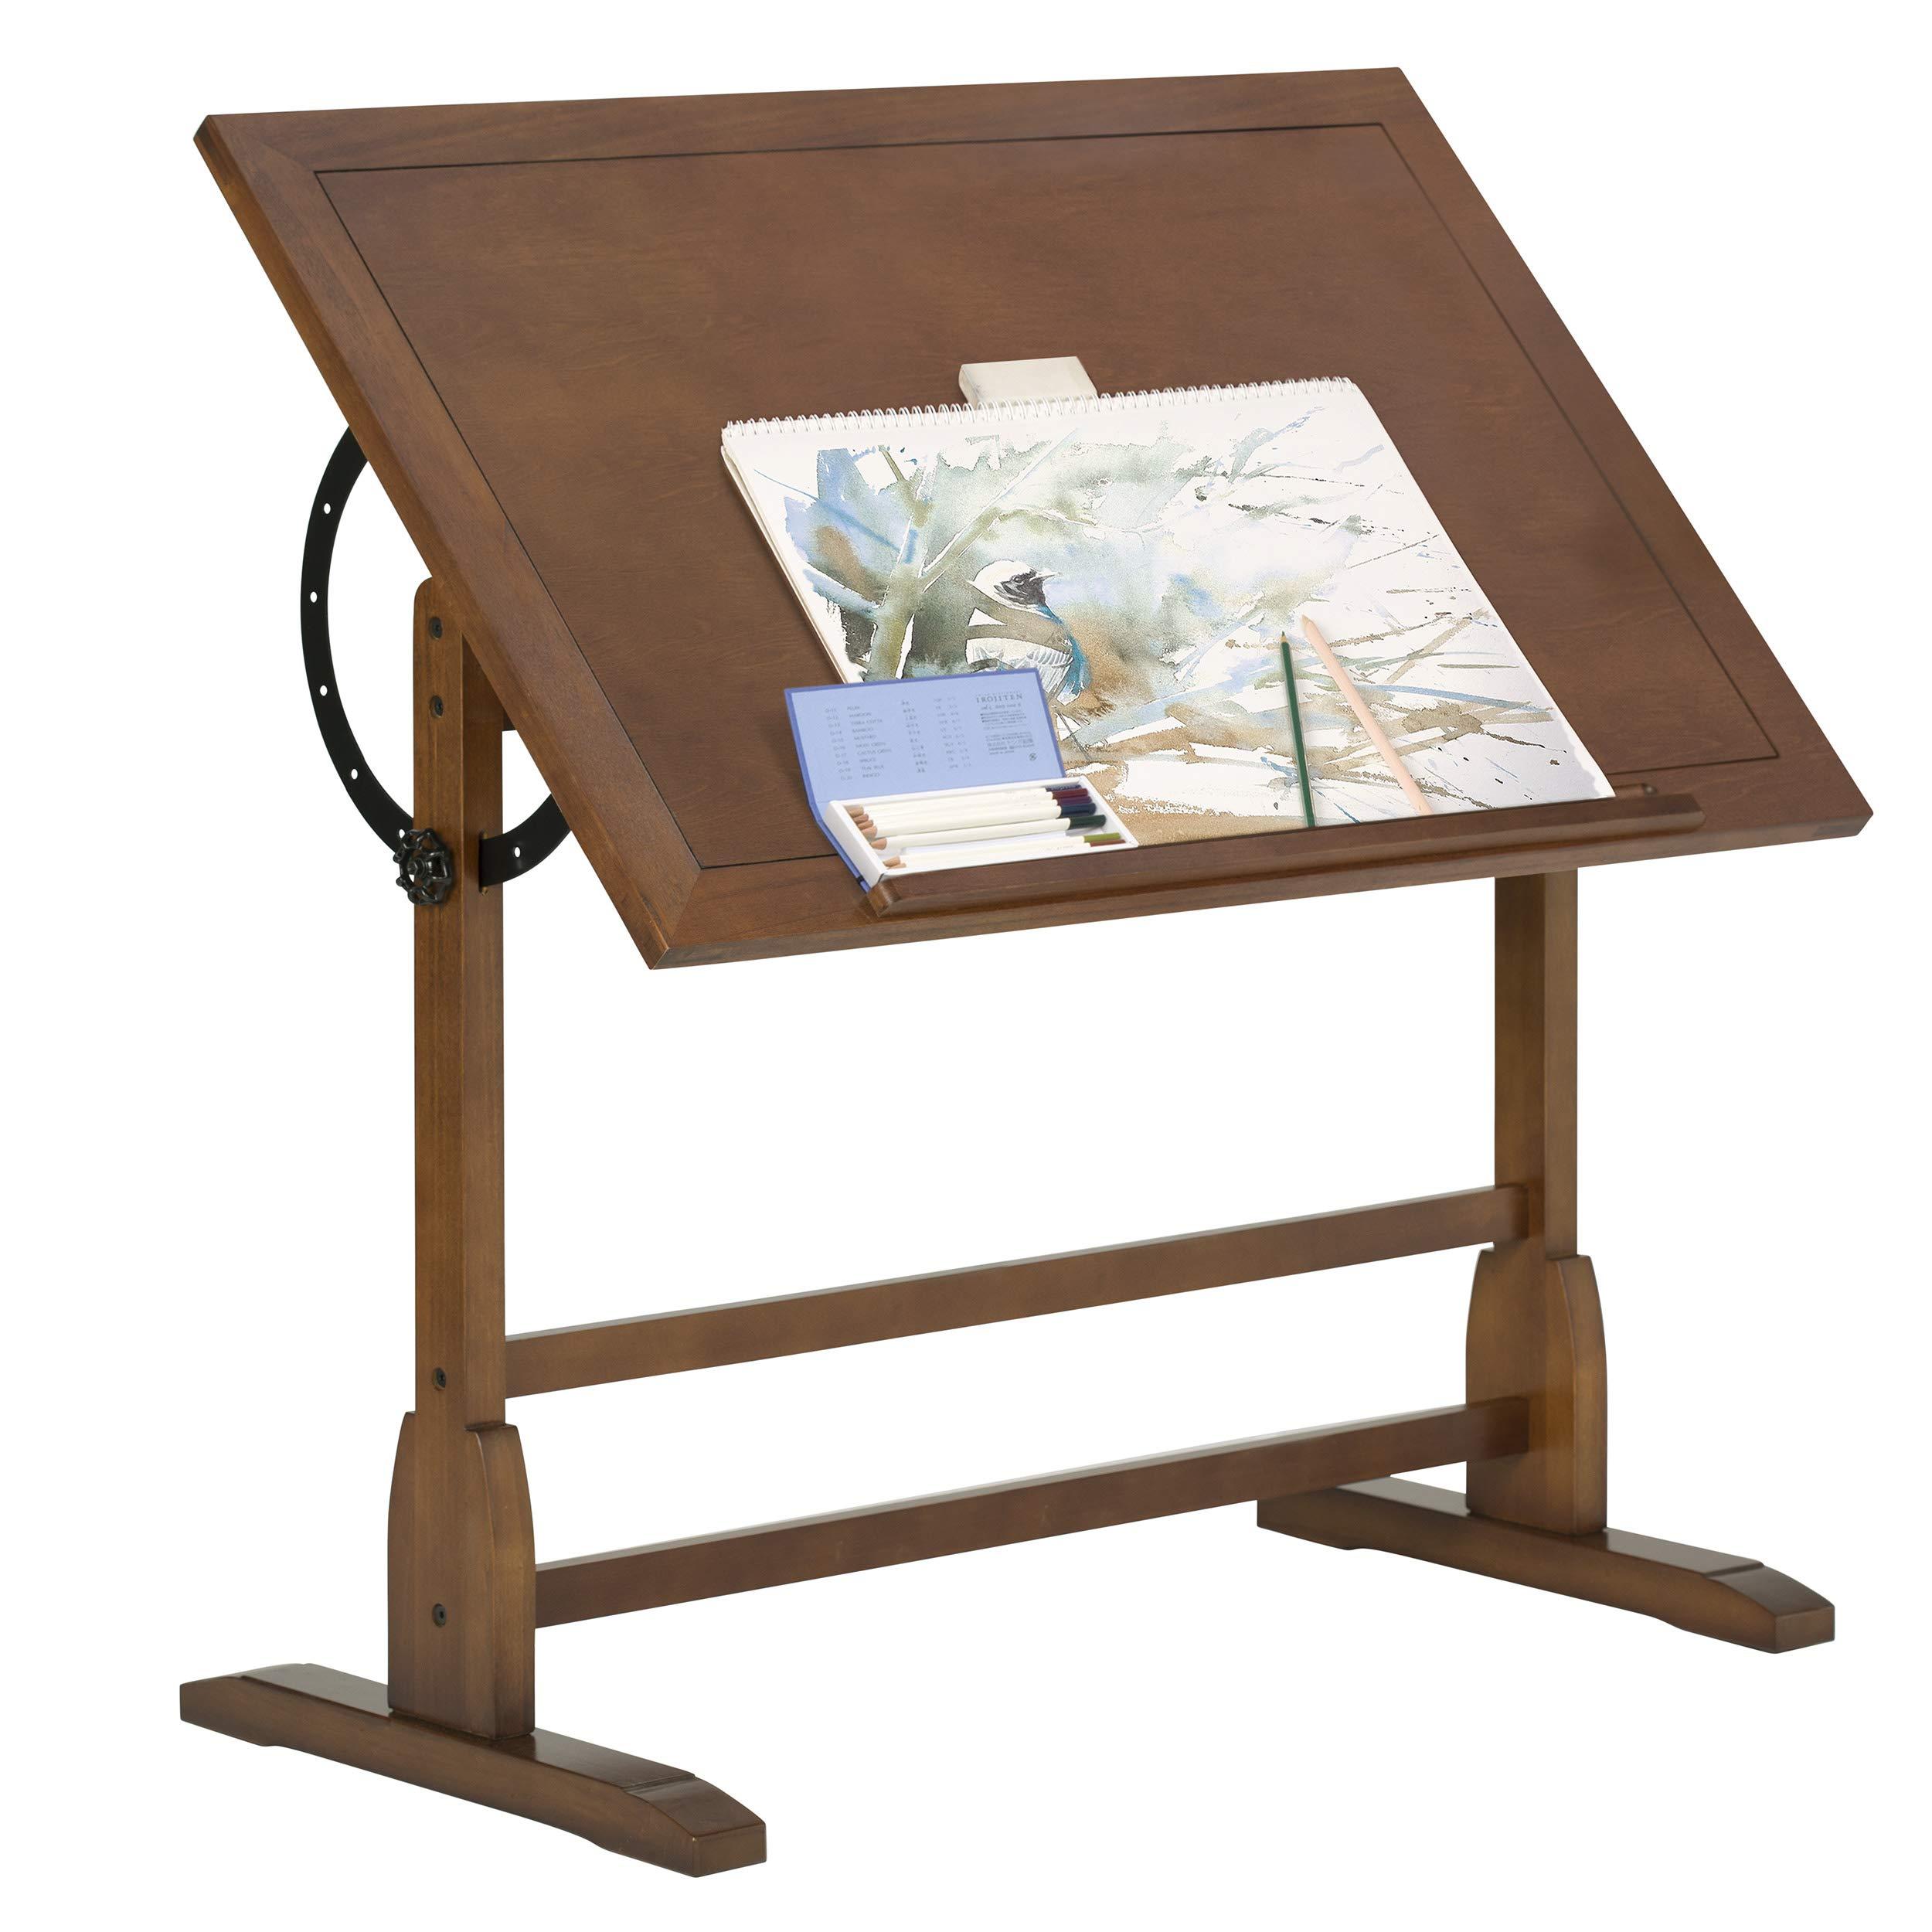 Vintage Rustic Oak Drafting Table, Top Adjustable Drafting Table Craft Table Drawing Desk Hobby Table Writing Desk Studio Desk, 42''W x 30''D